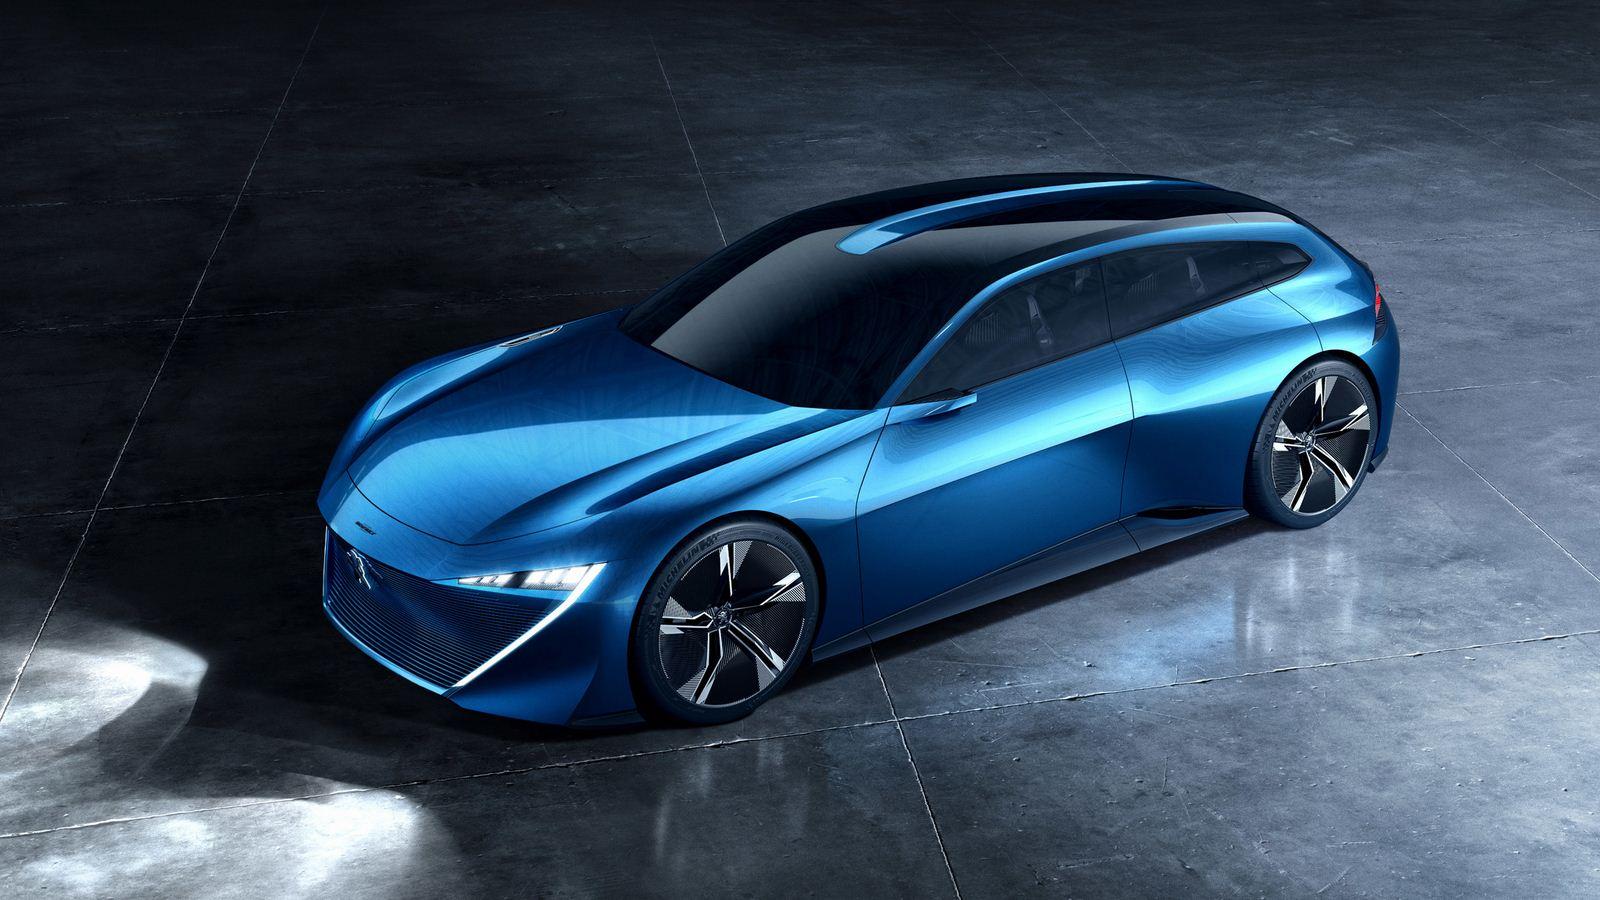 2017-Peugeot-Instinct-Concept-18